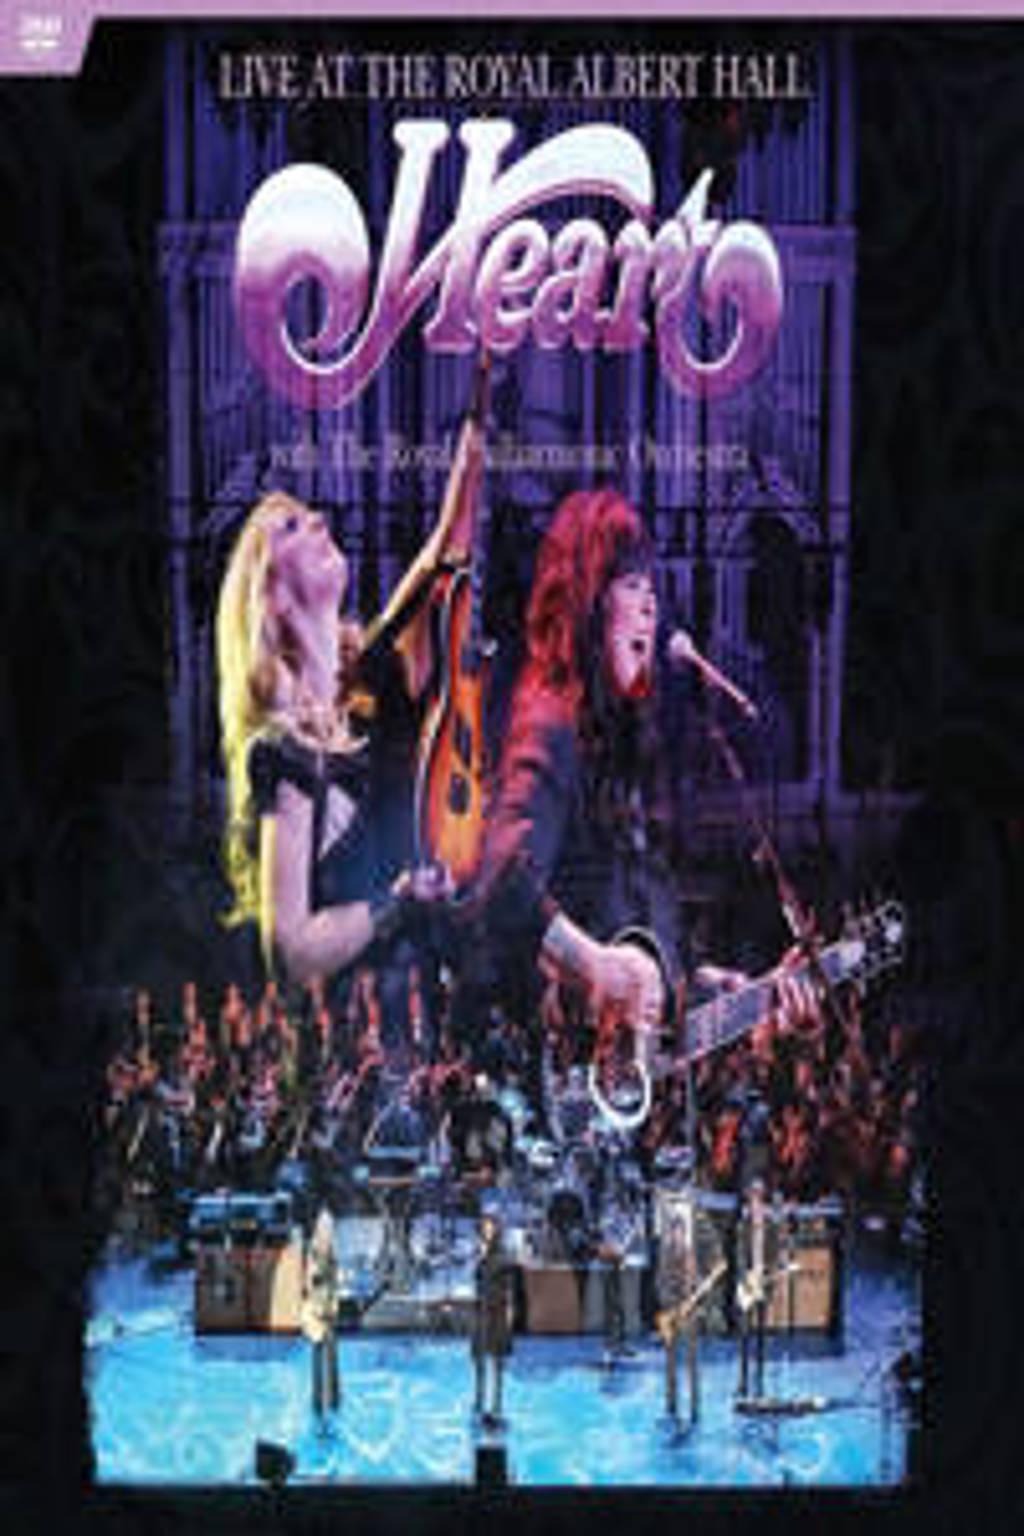 Heart - Live At The Royal Albert Hall (DVD)